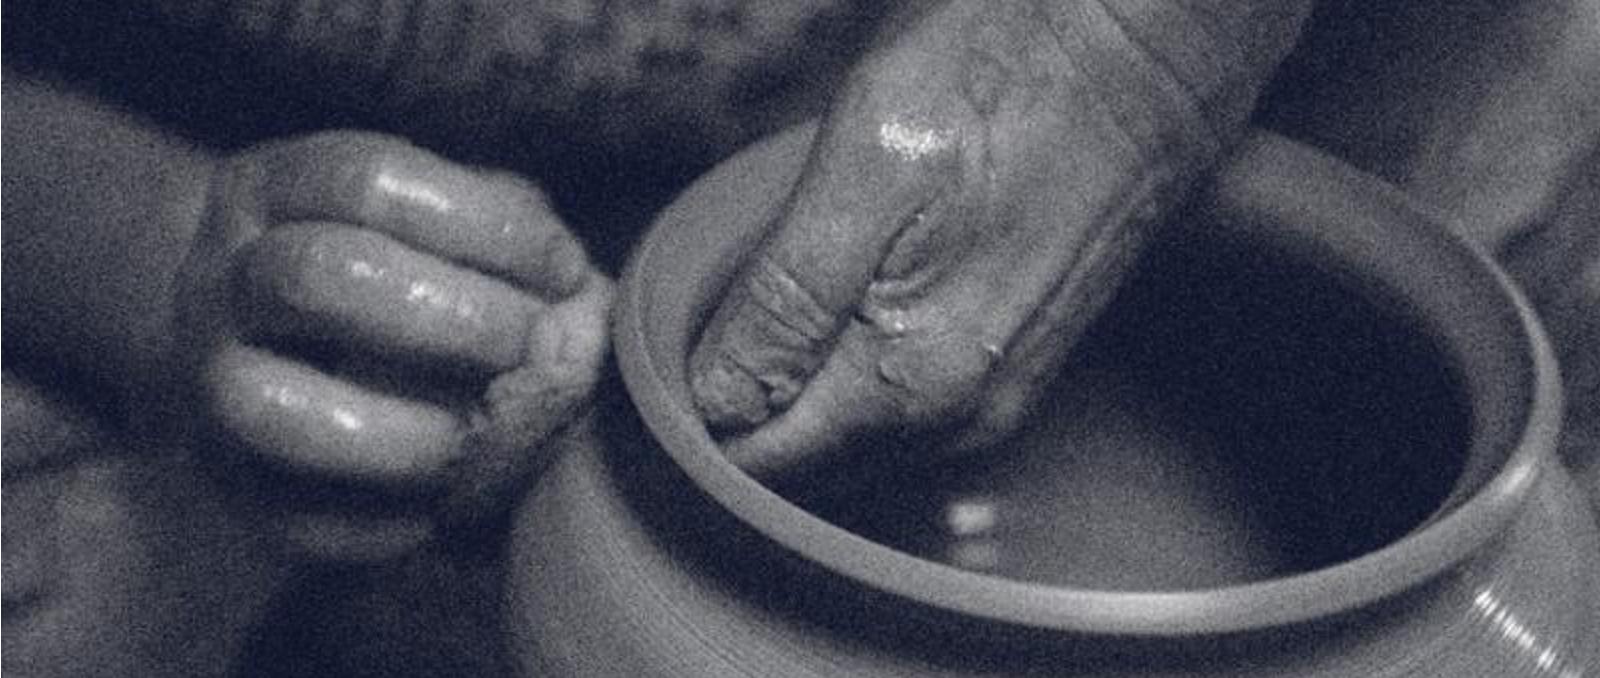 RIIJA-hands1